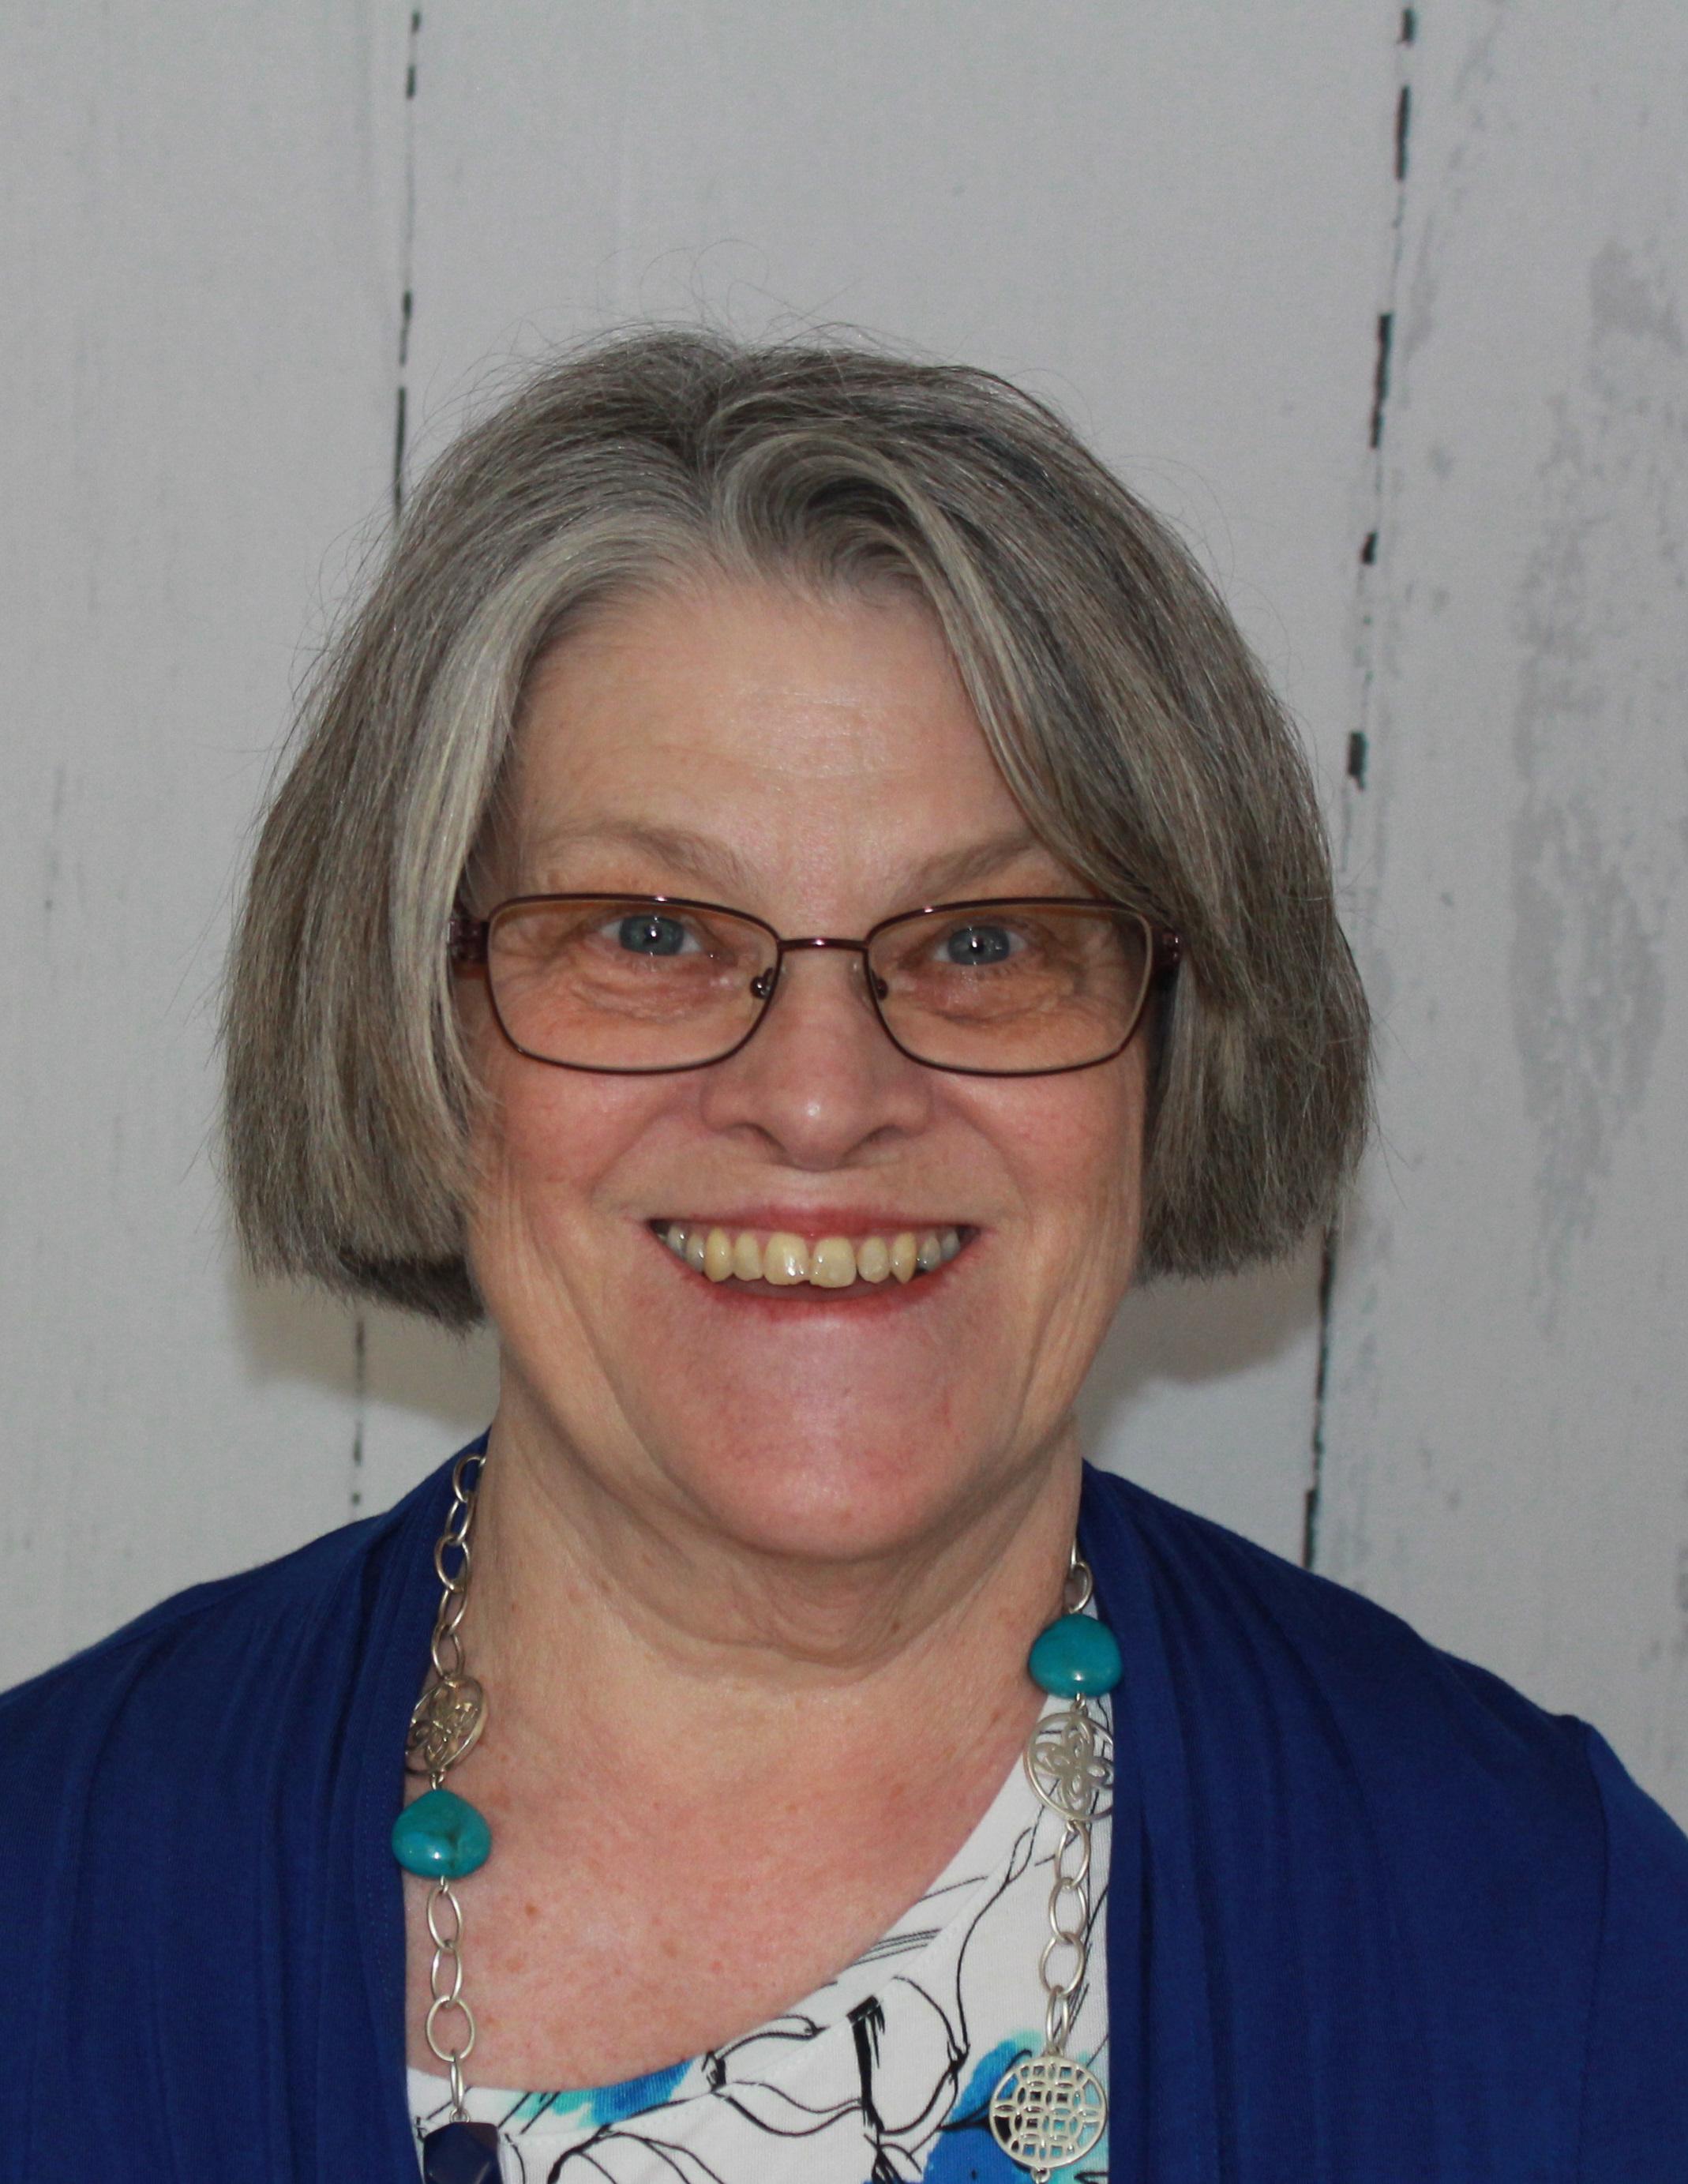 Mary Brouillard